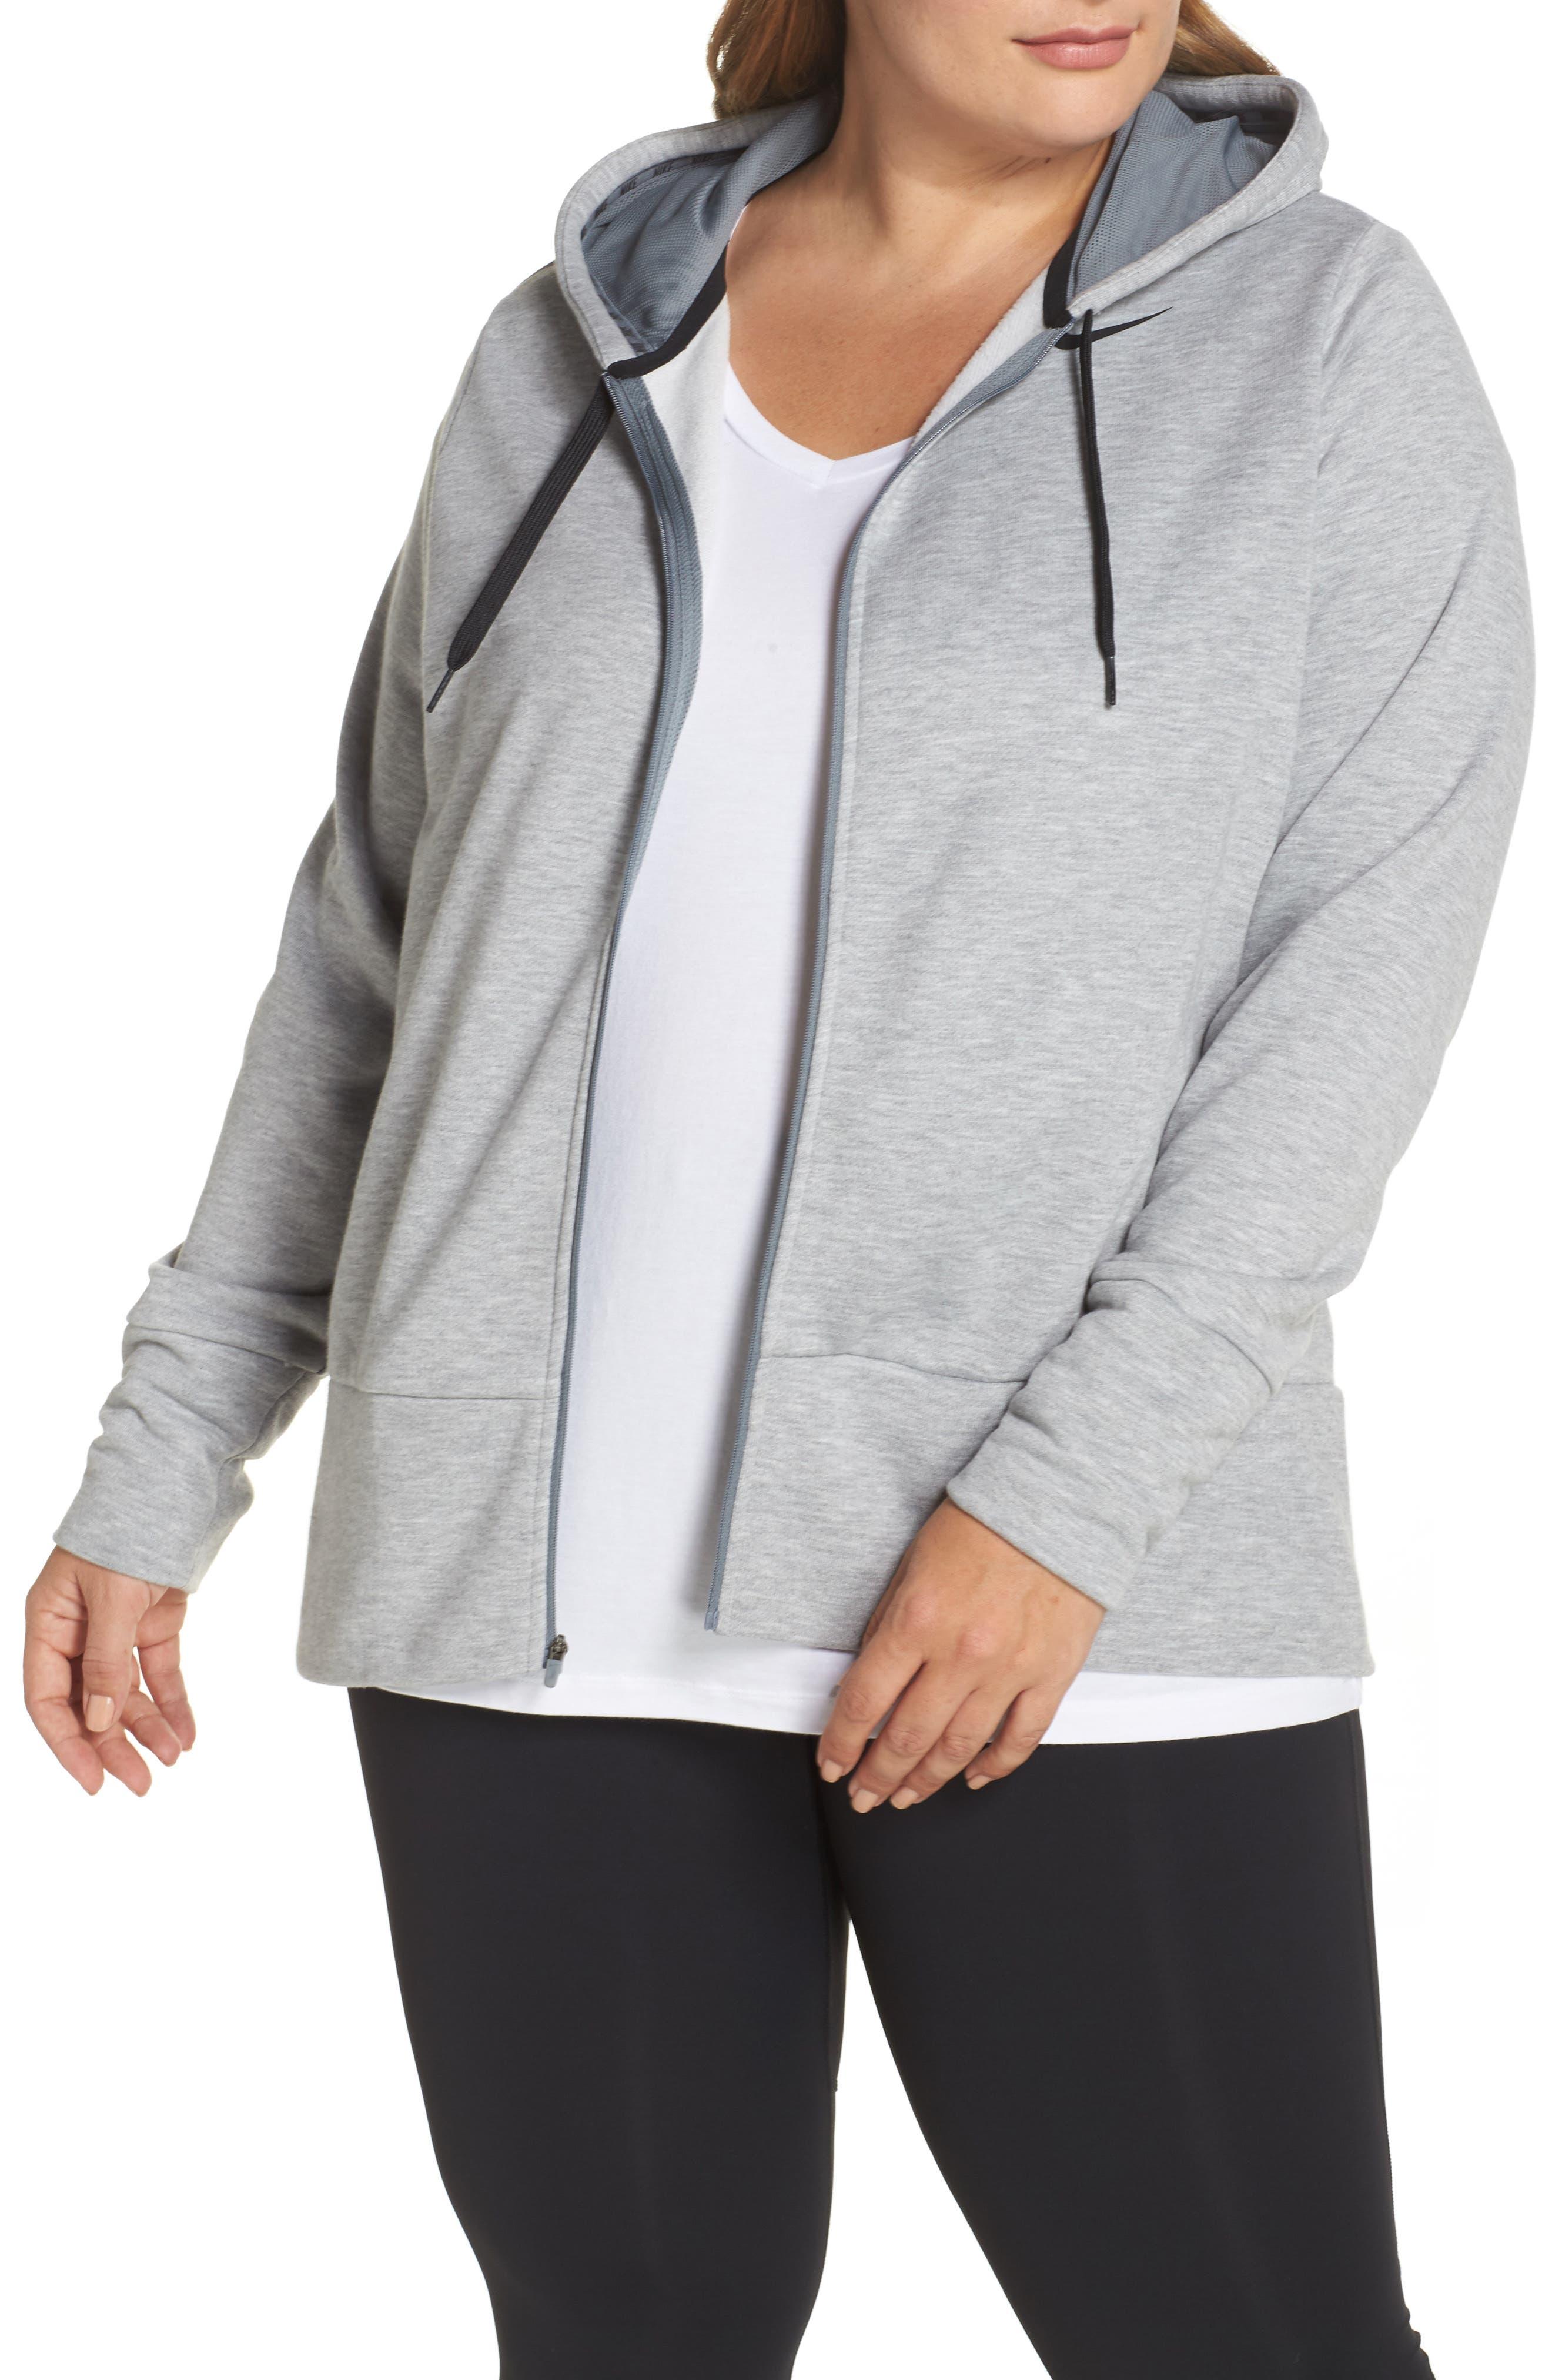 Dry-FIT Oversize Zip Hoodie,                         Main,                         color, Dk Grey Heather/ Cool Grey